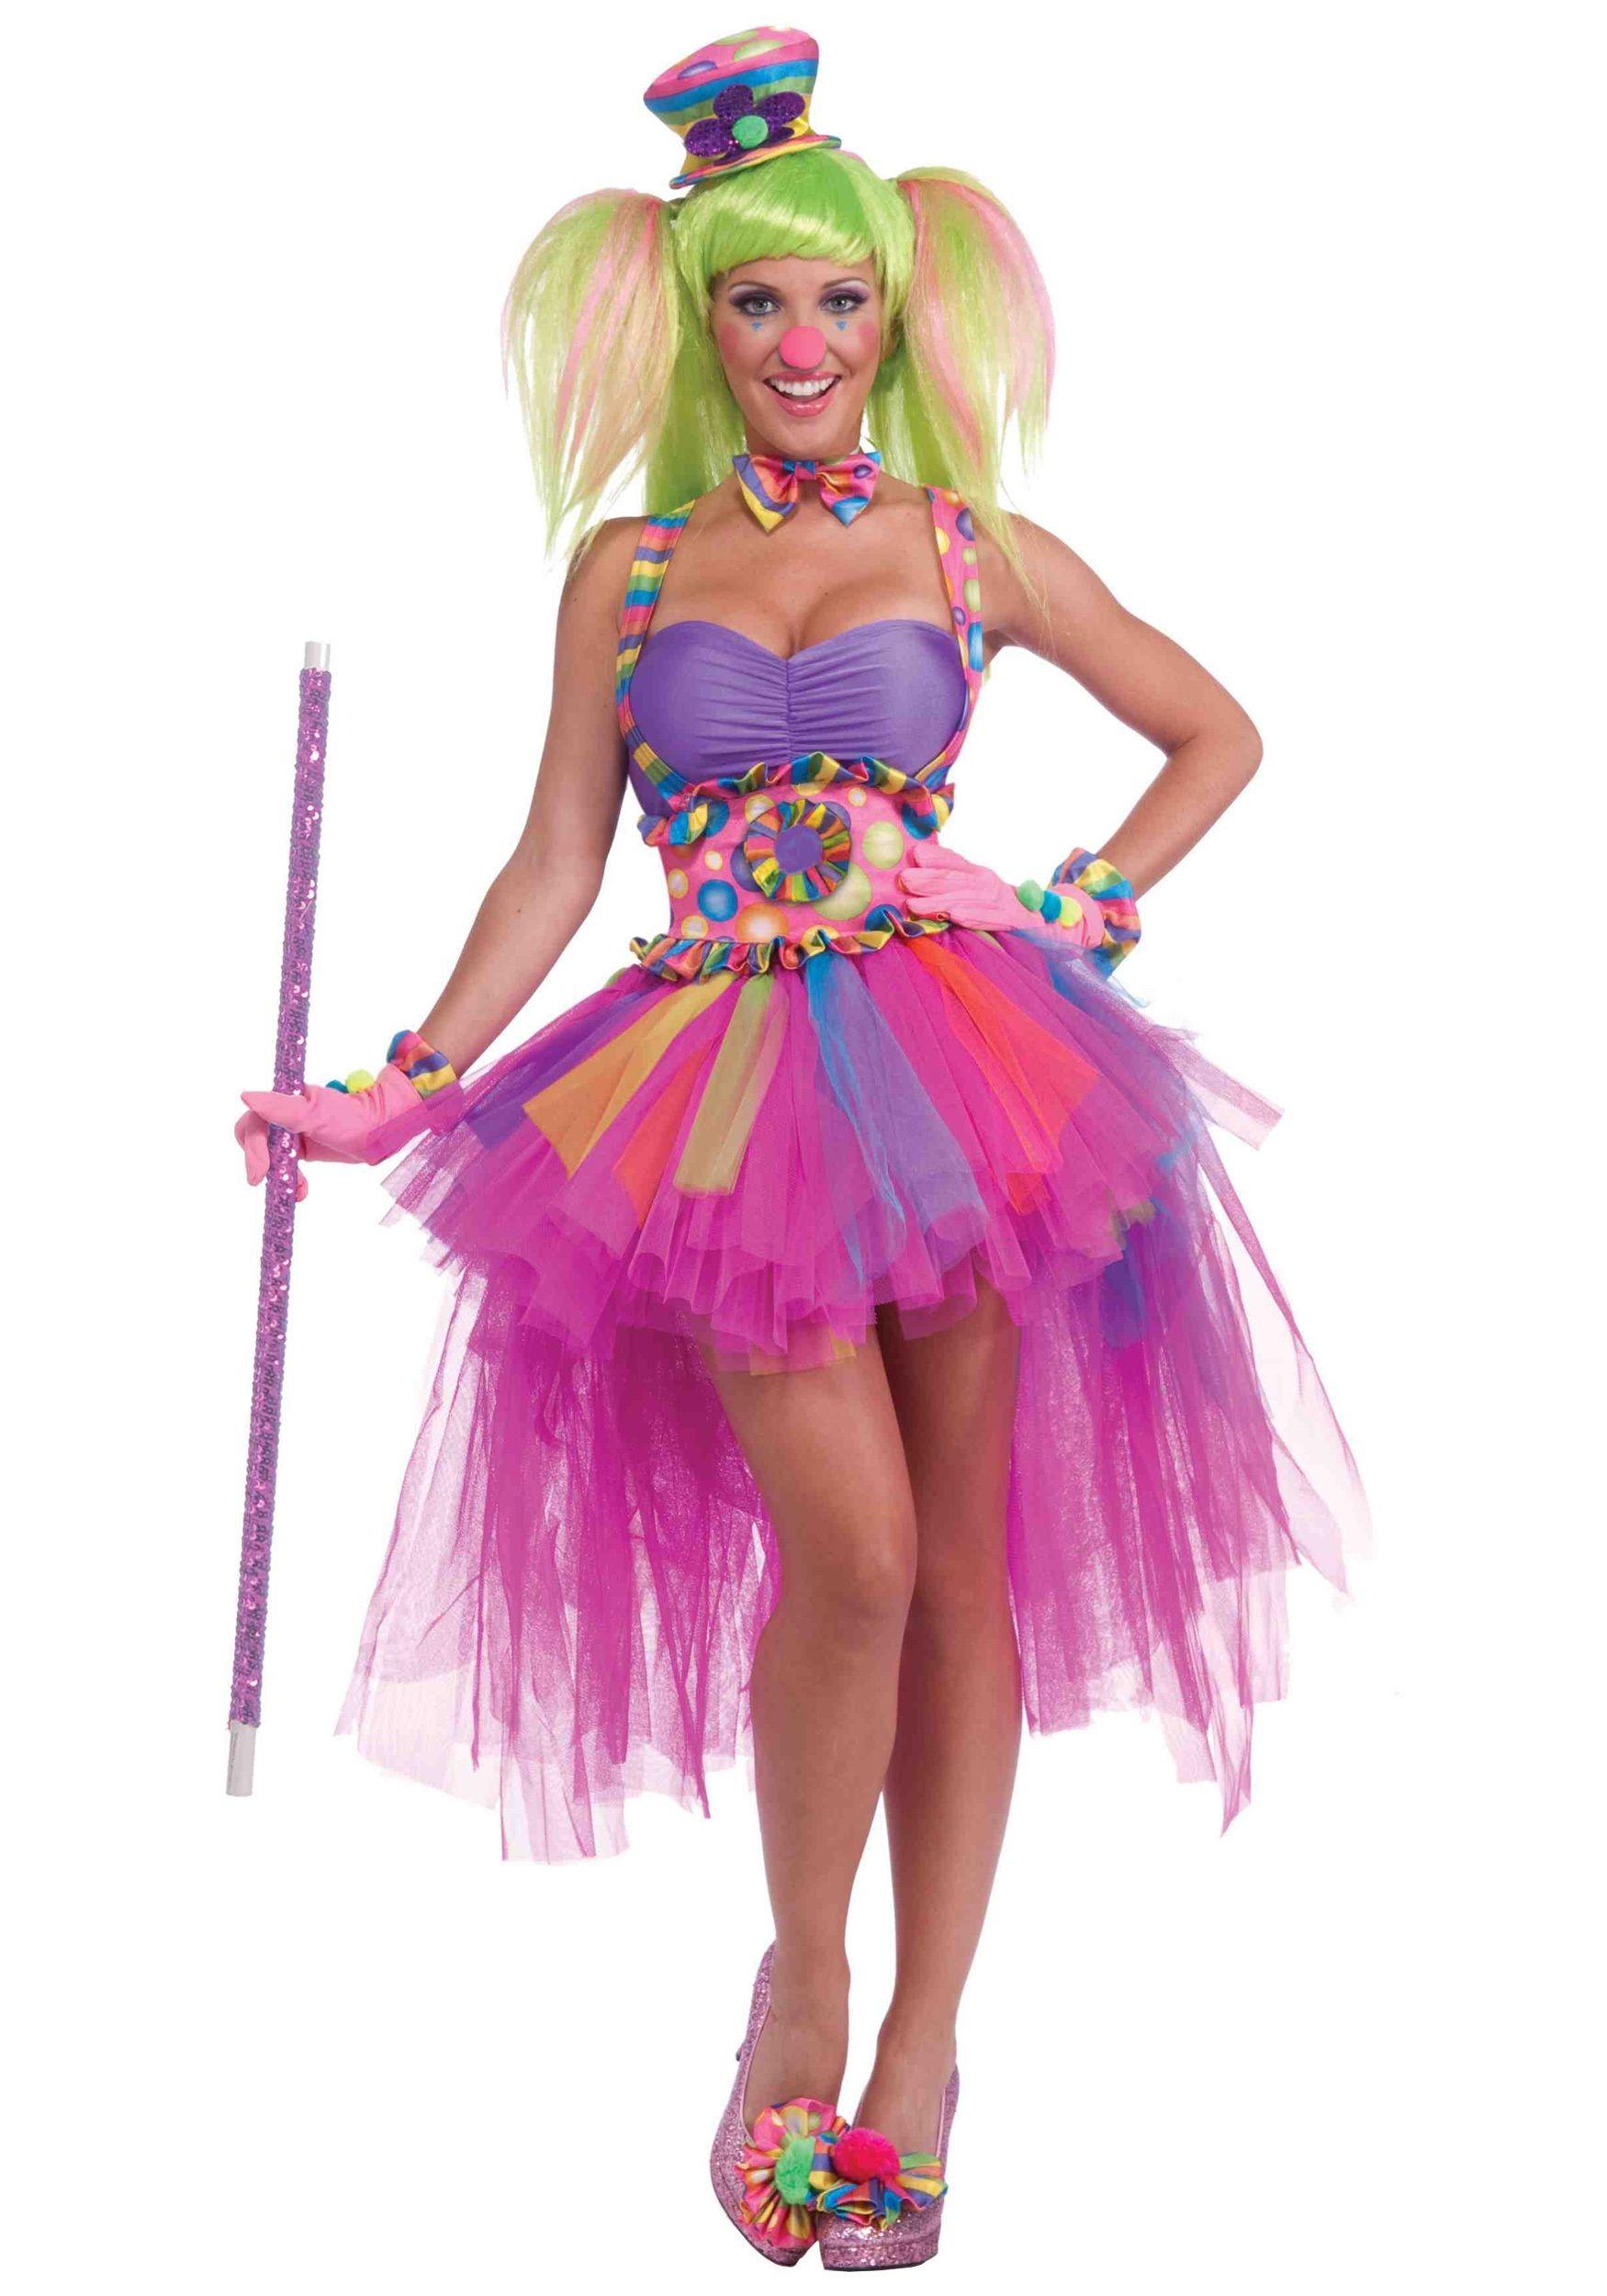 Adult girl clown costume